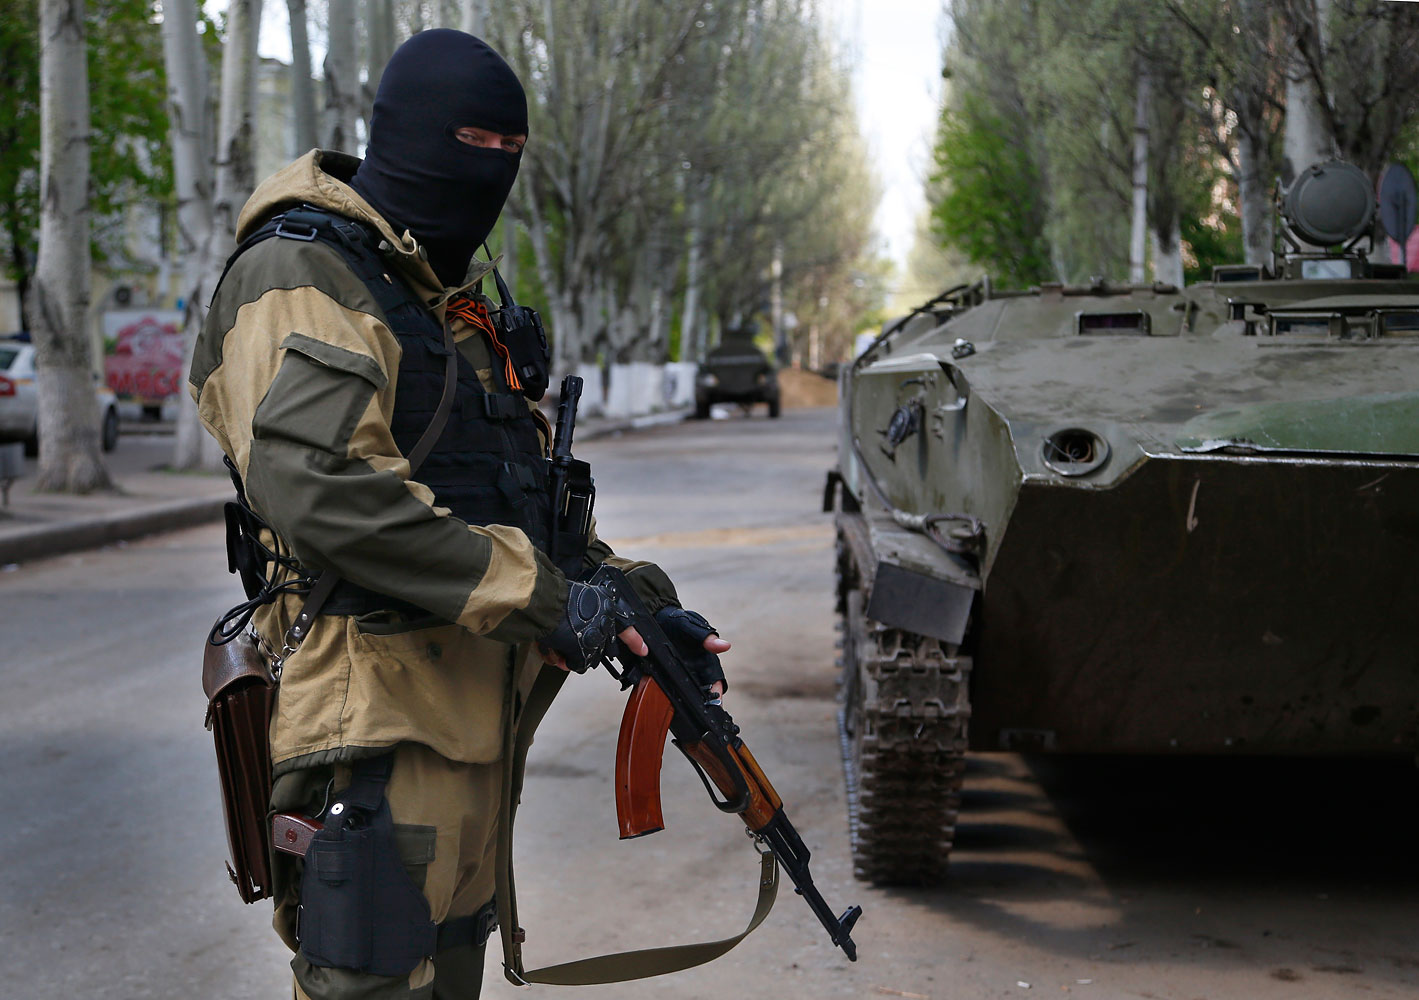 A pro-Russian masked gunman patrols a street  in the center of Slovyansk, eastern Ukraine, April 23, 2014.